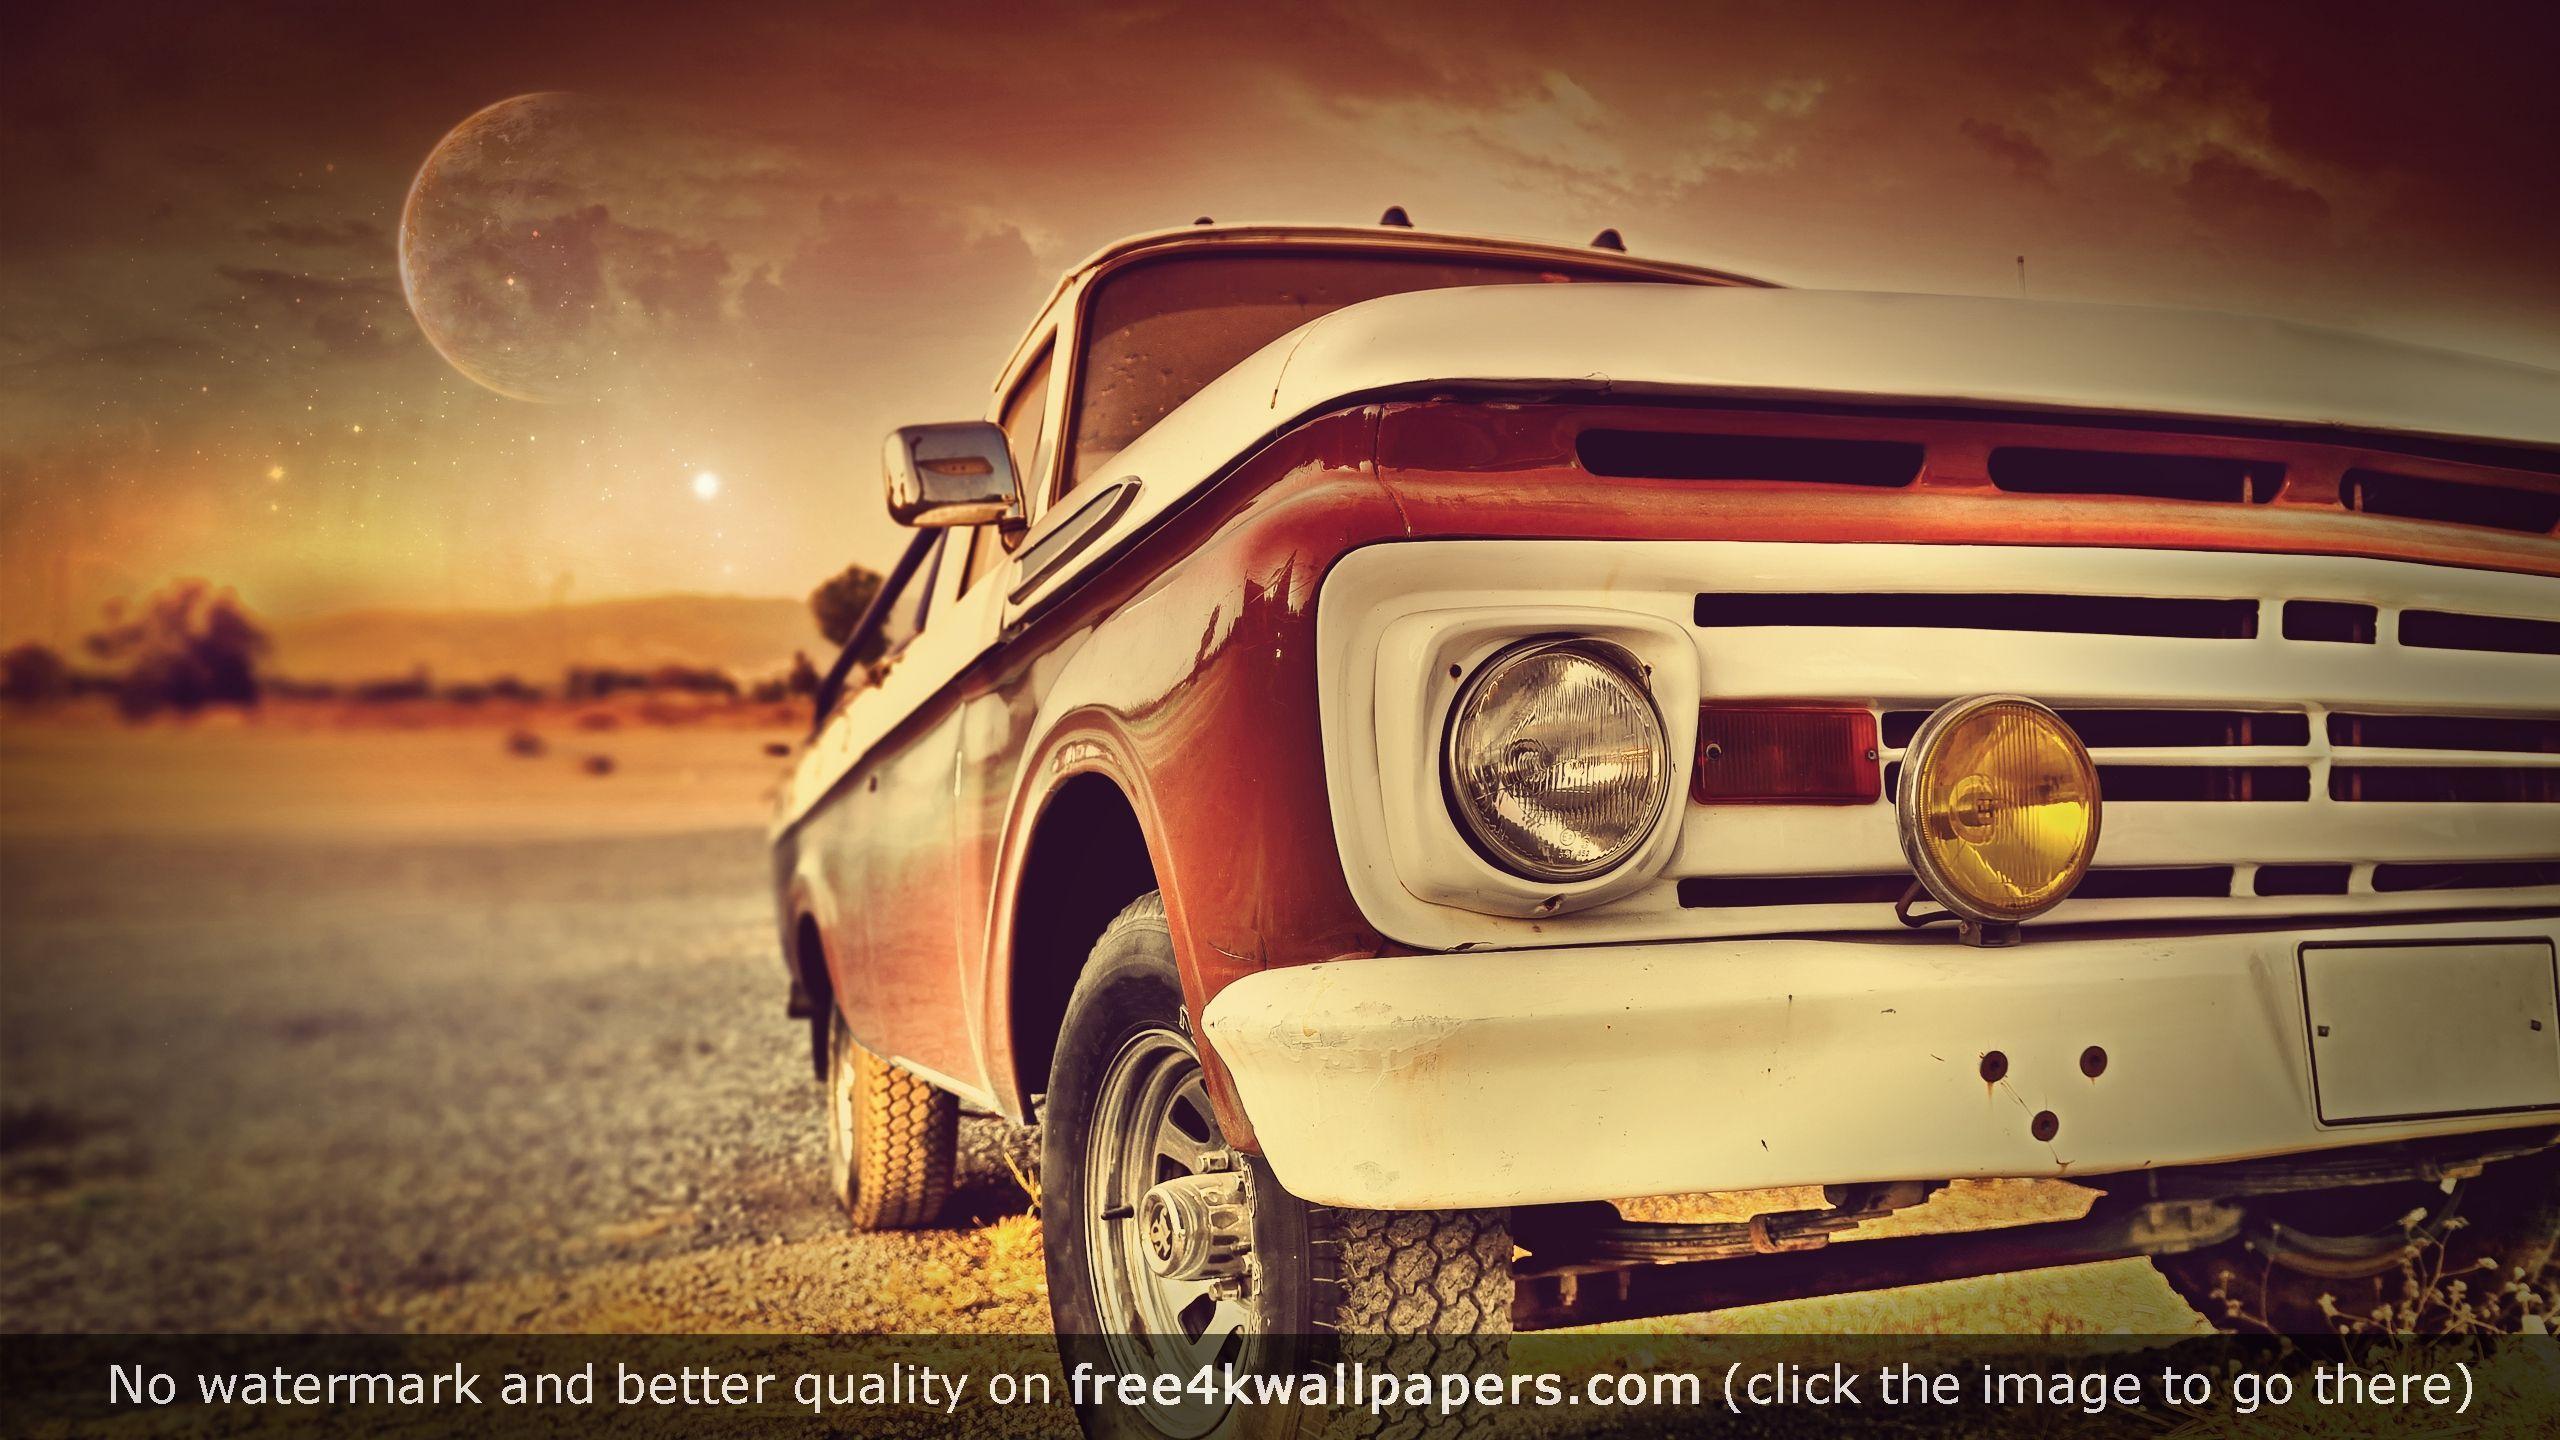 Vintage Car Hd Wallpaper Vintage Car Wallpaper Car Wallpapers Retro Cars